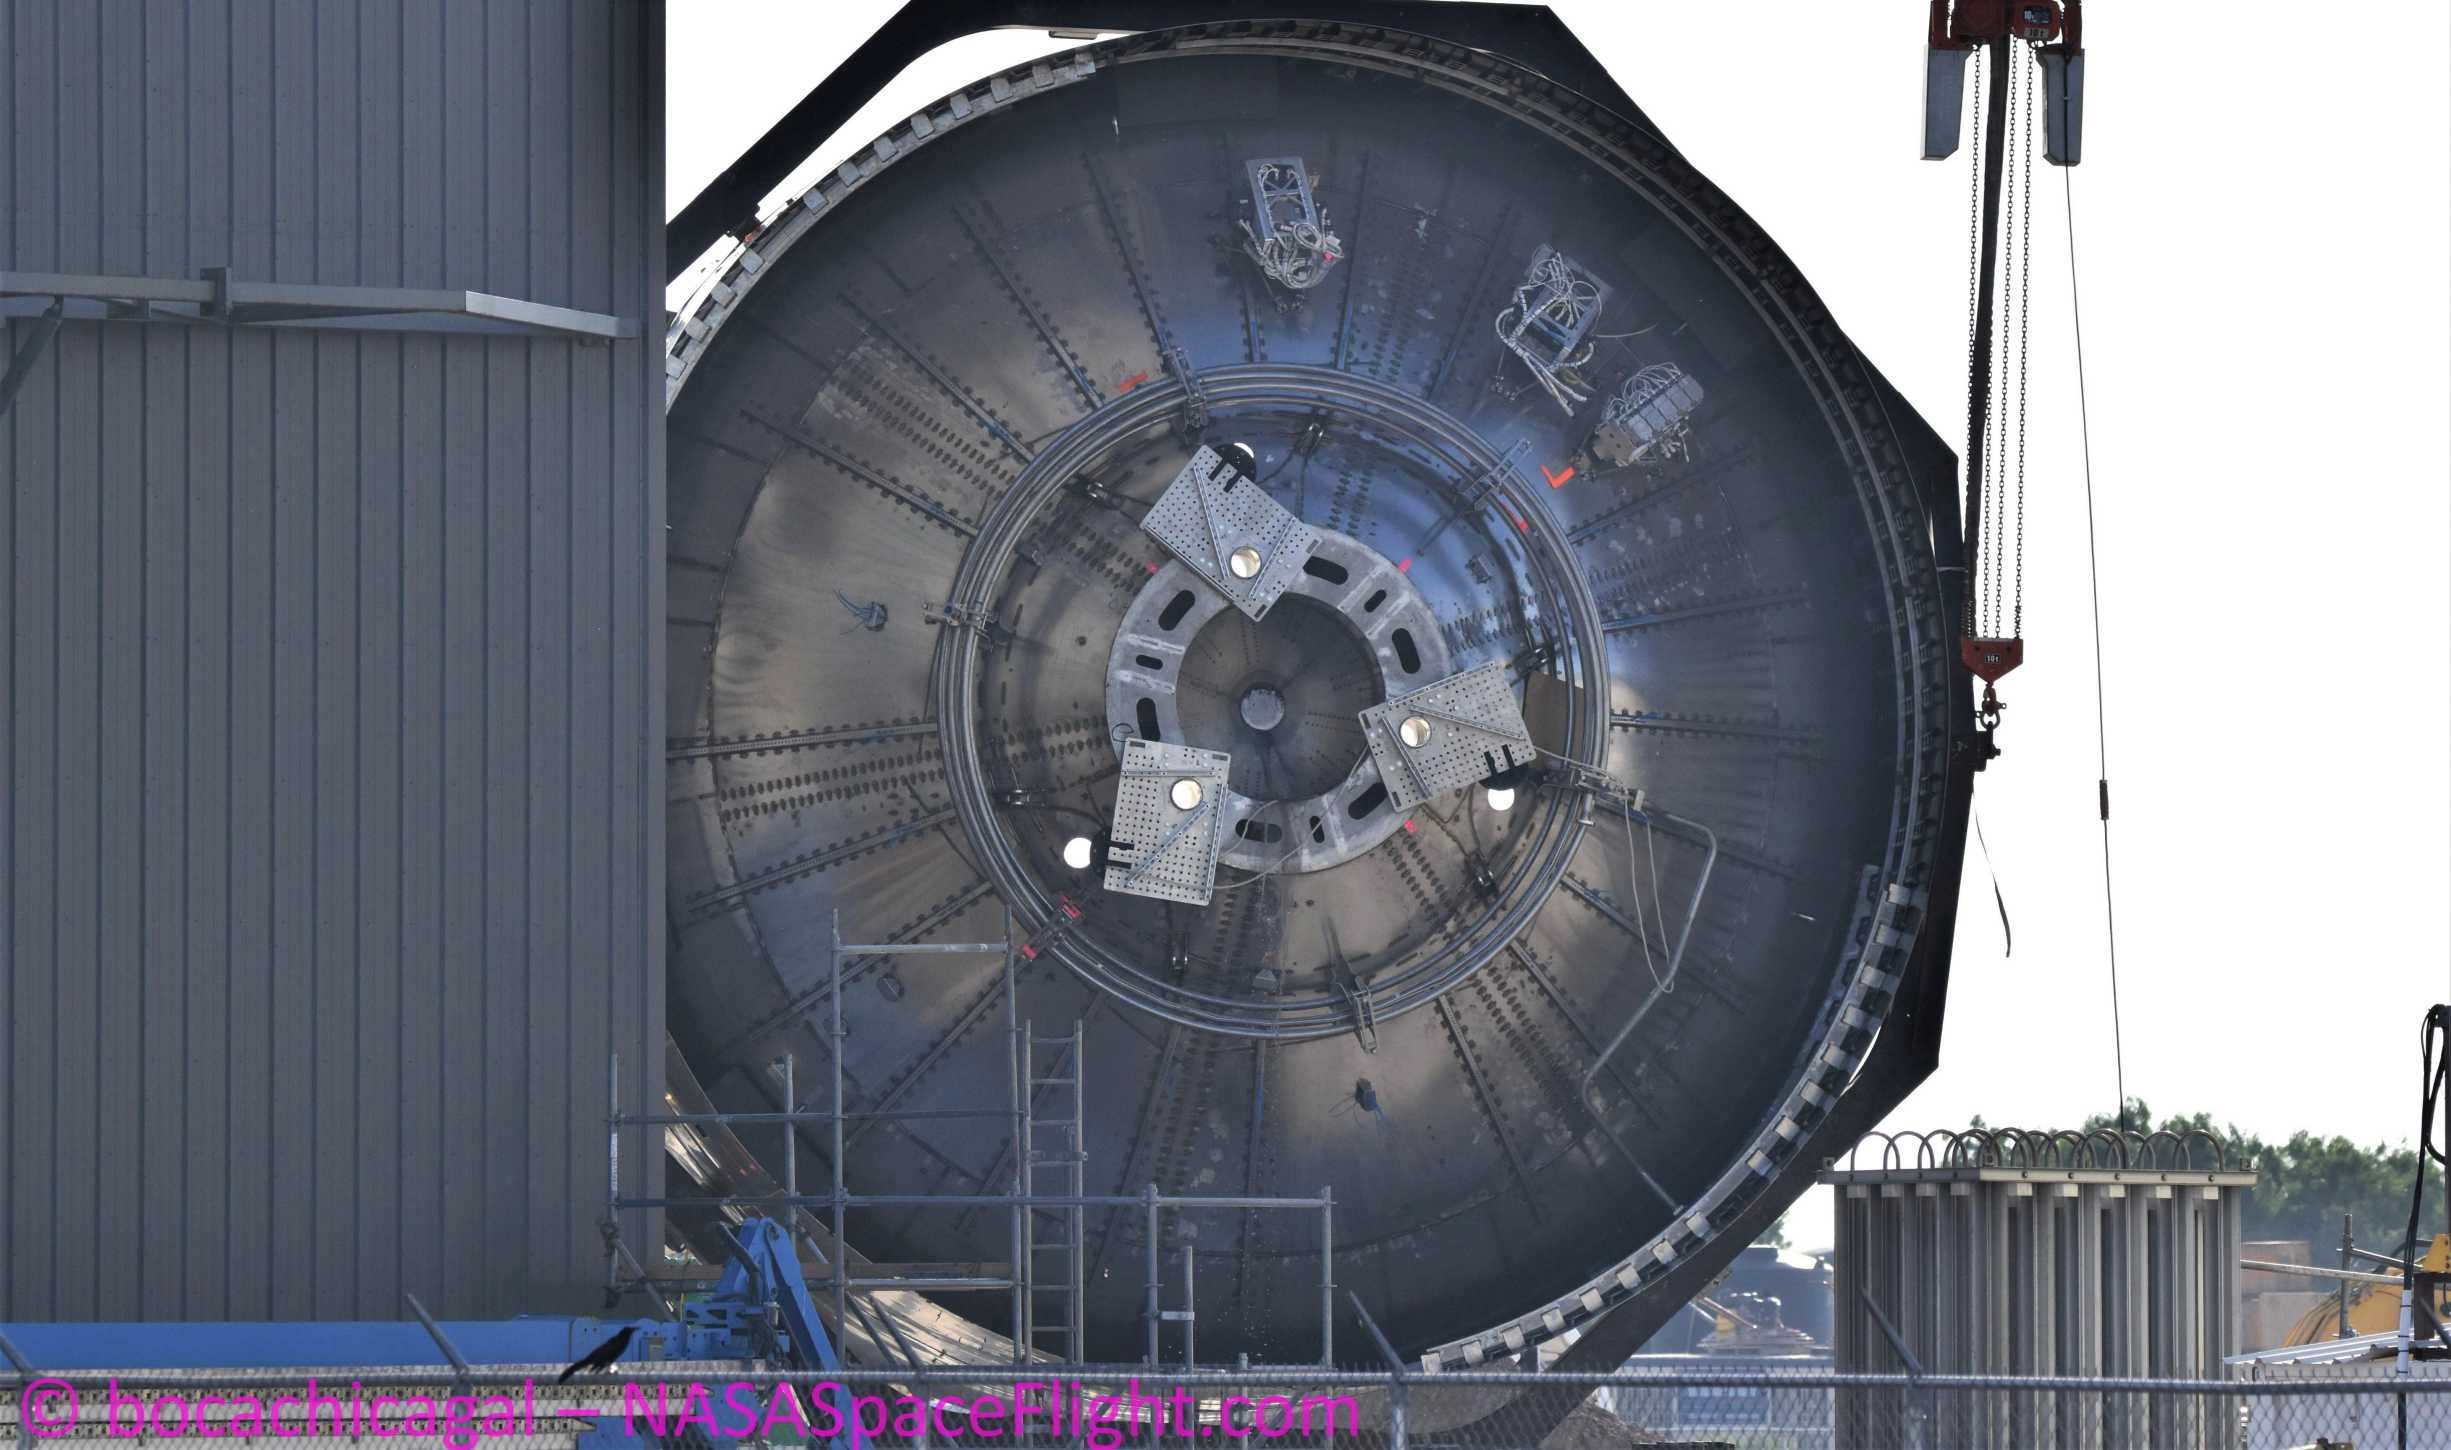 Starship Boca Chica 041220 (NASASpaceflight – bocachicagal) SN4 engine section flip 4 crop (c)